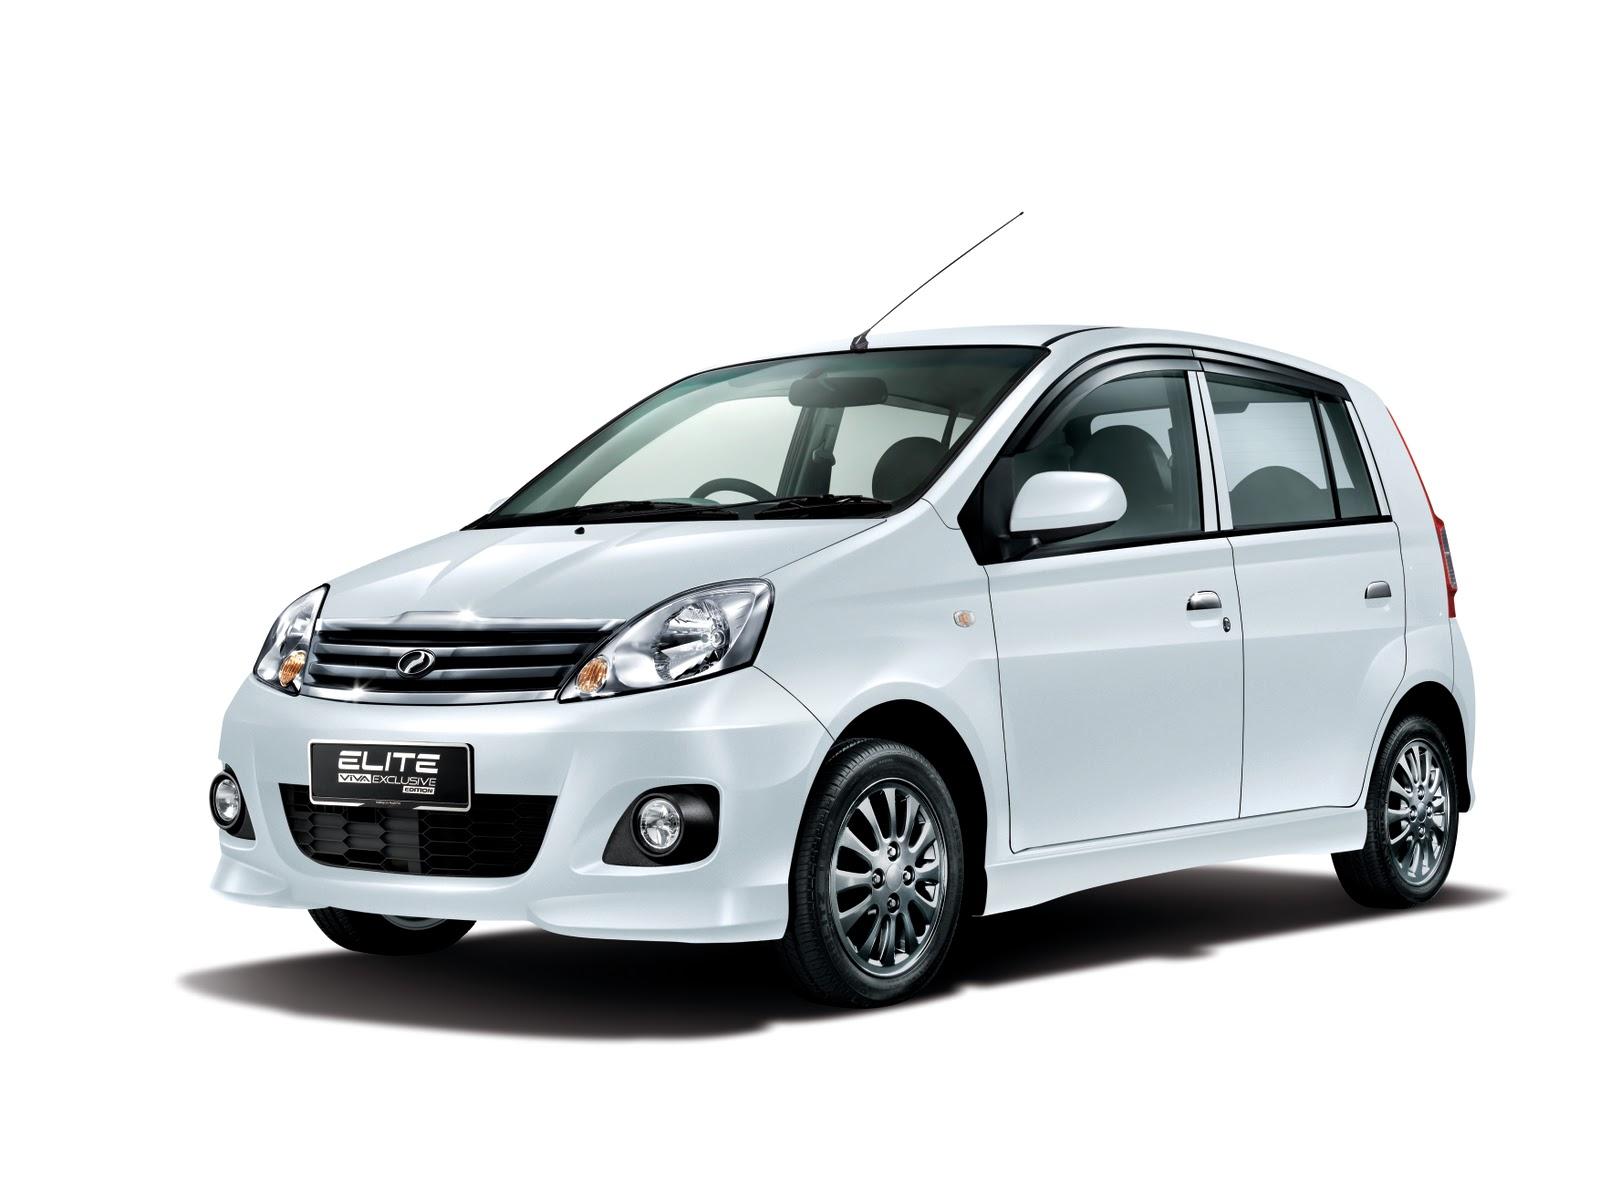 Harga Baru Perodua VIVA Setelah Diturunkan Harga RM5300